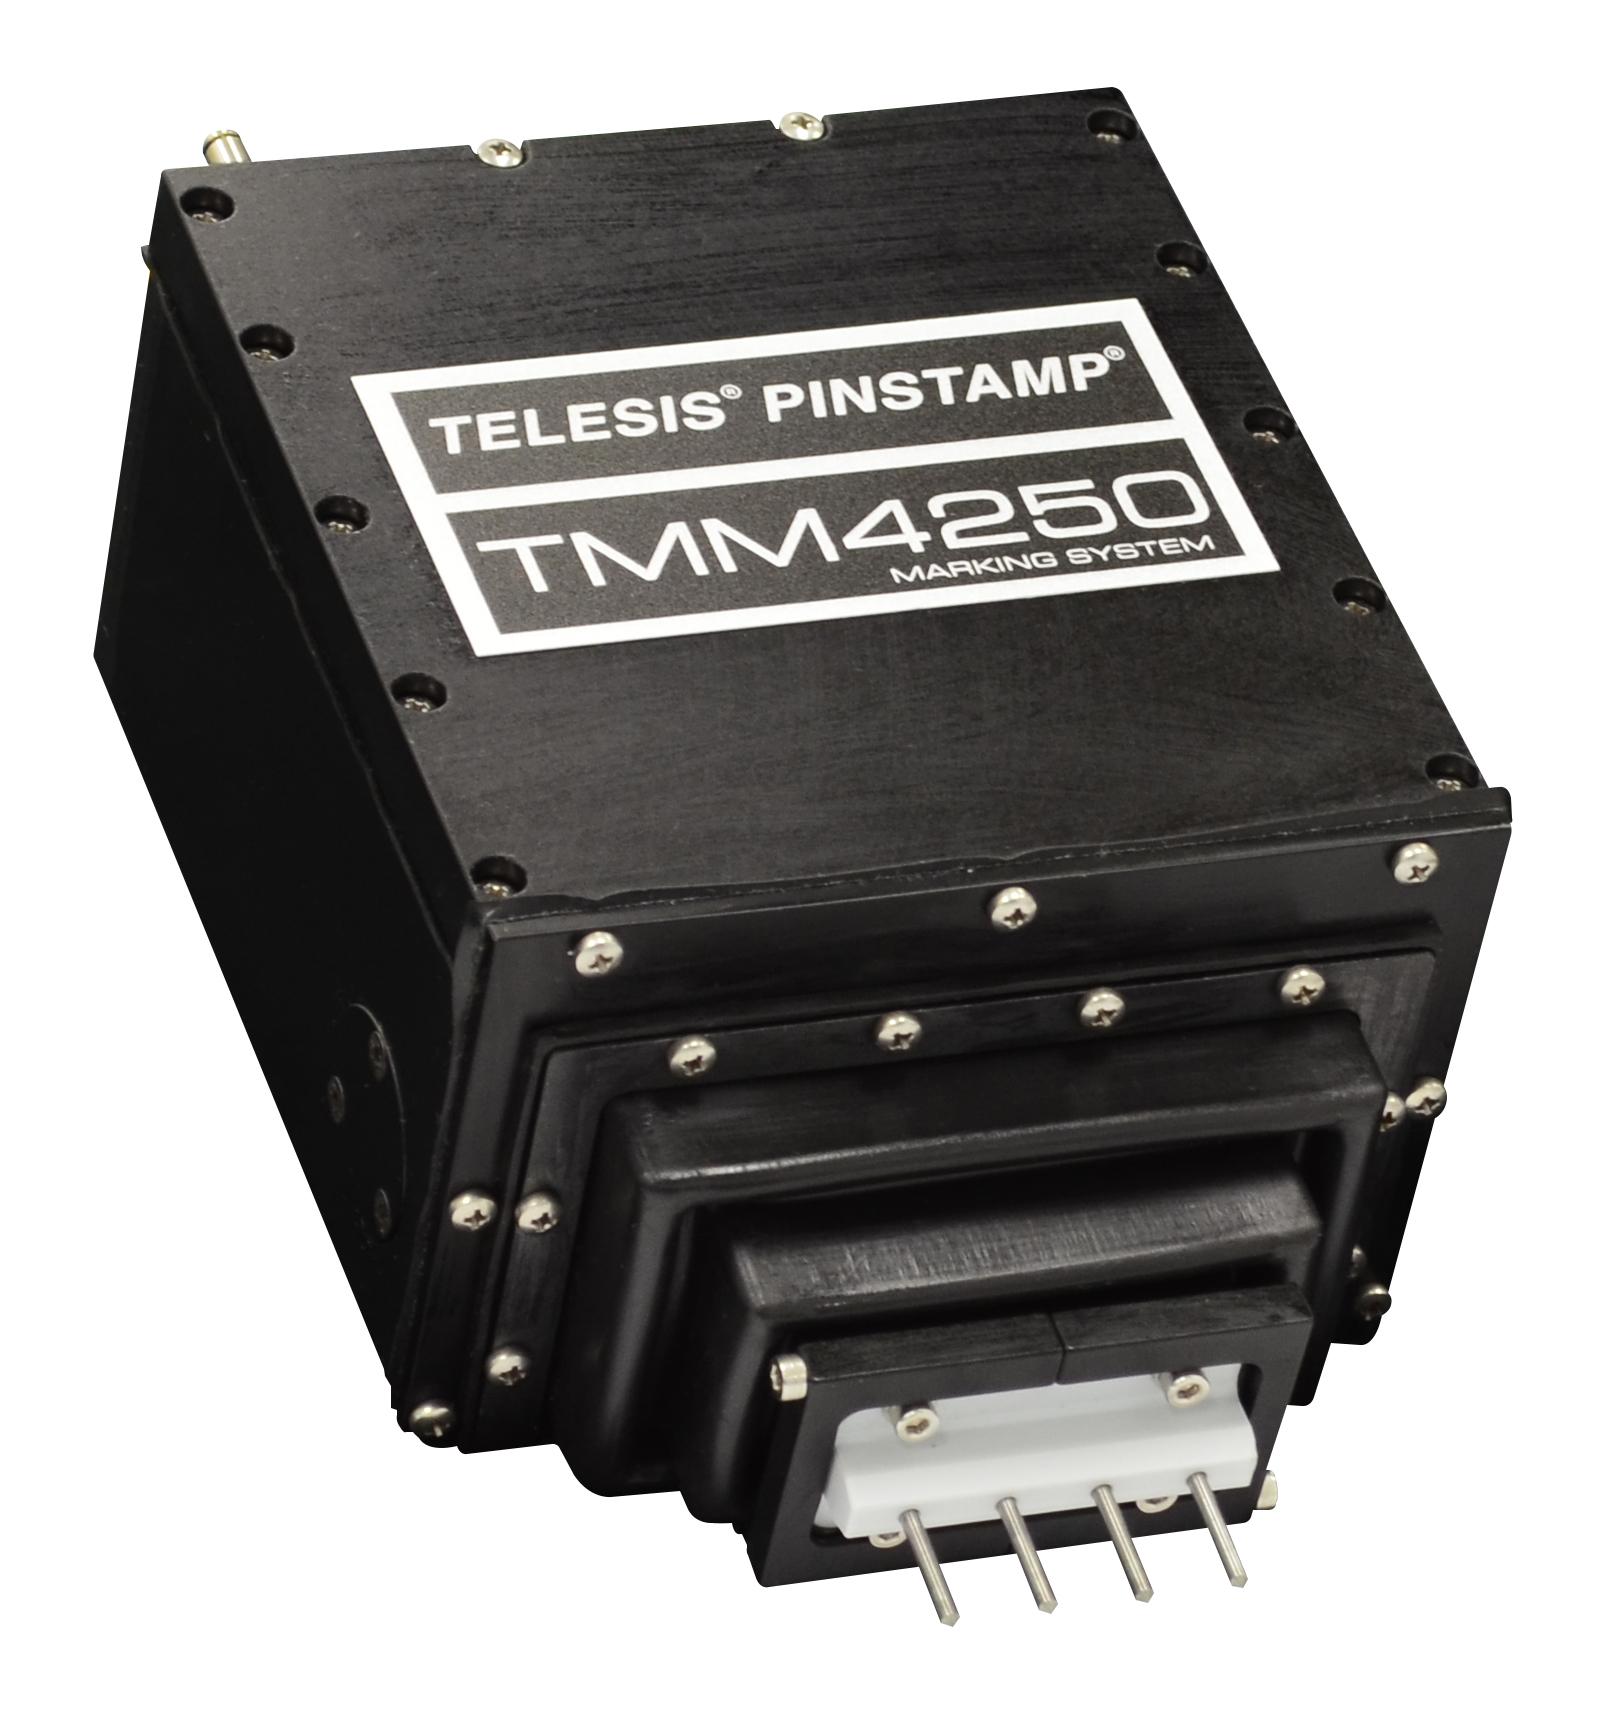 Micropercusión Telesis Pinstamp 4250